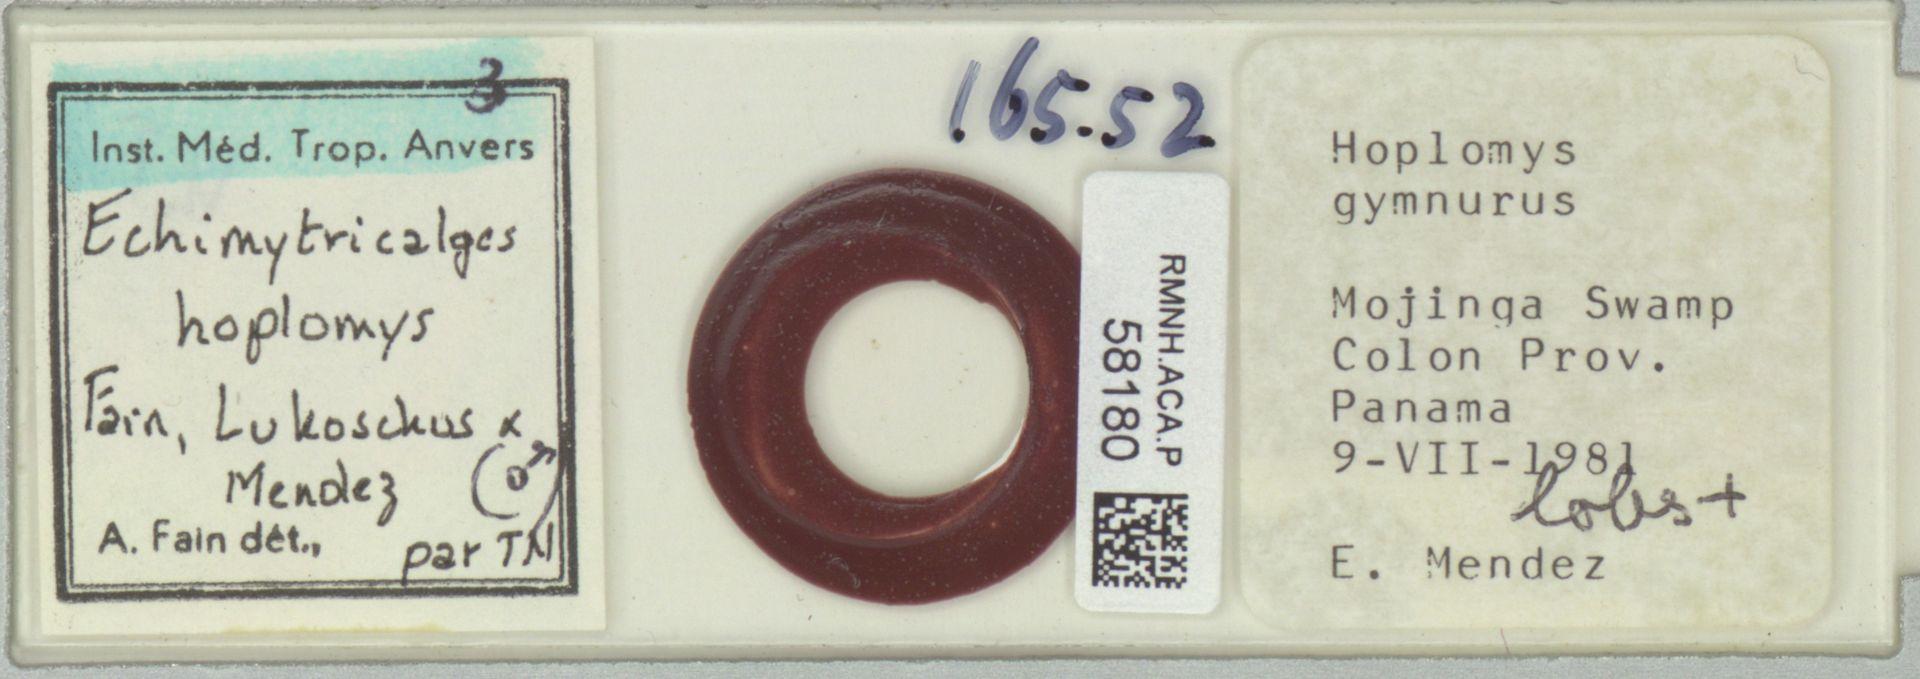 RMNH.ACA.P.58180 | Echimytricalges hoplomys Fain, Lukoschus & Mendez